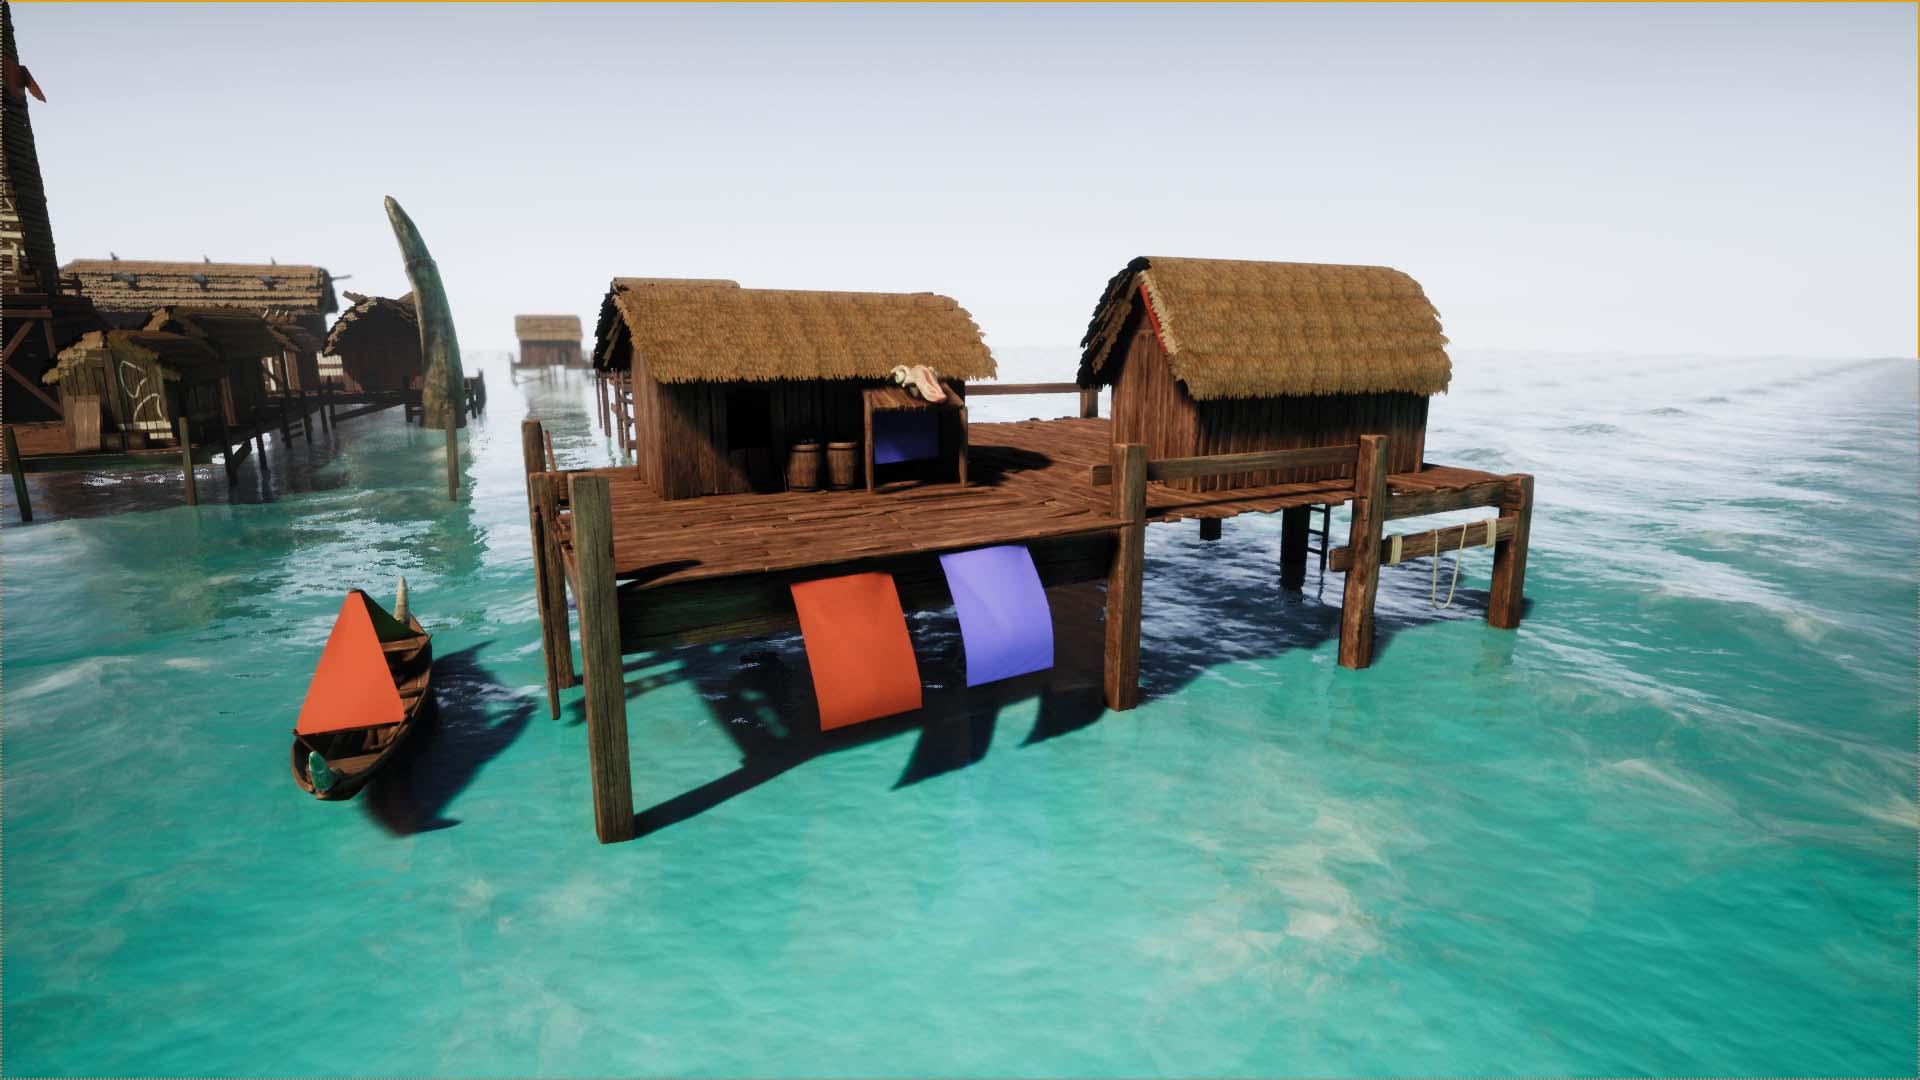 Unreal Engine Fishing Village   The Rookies